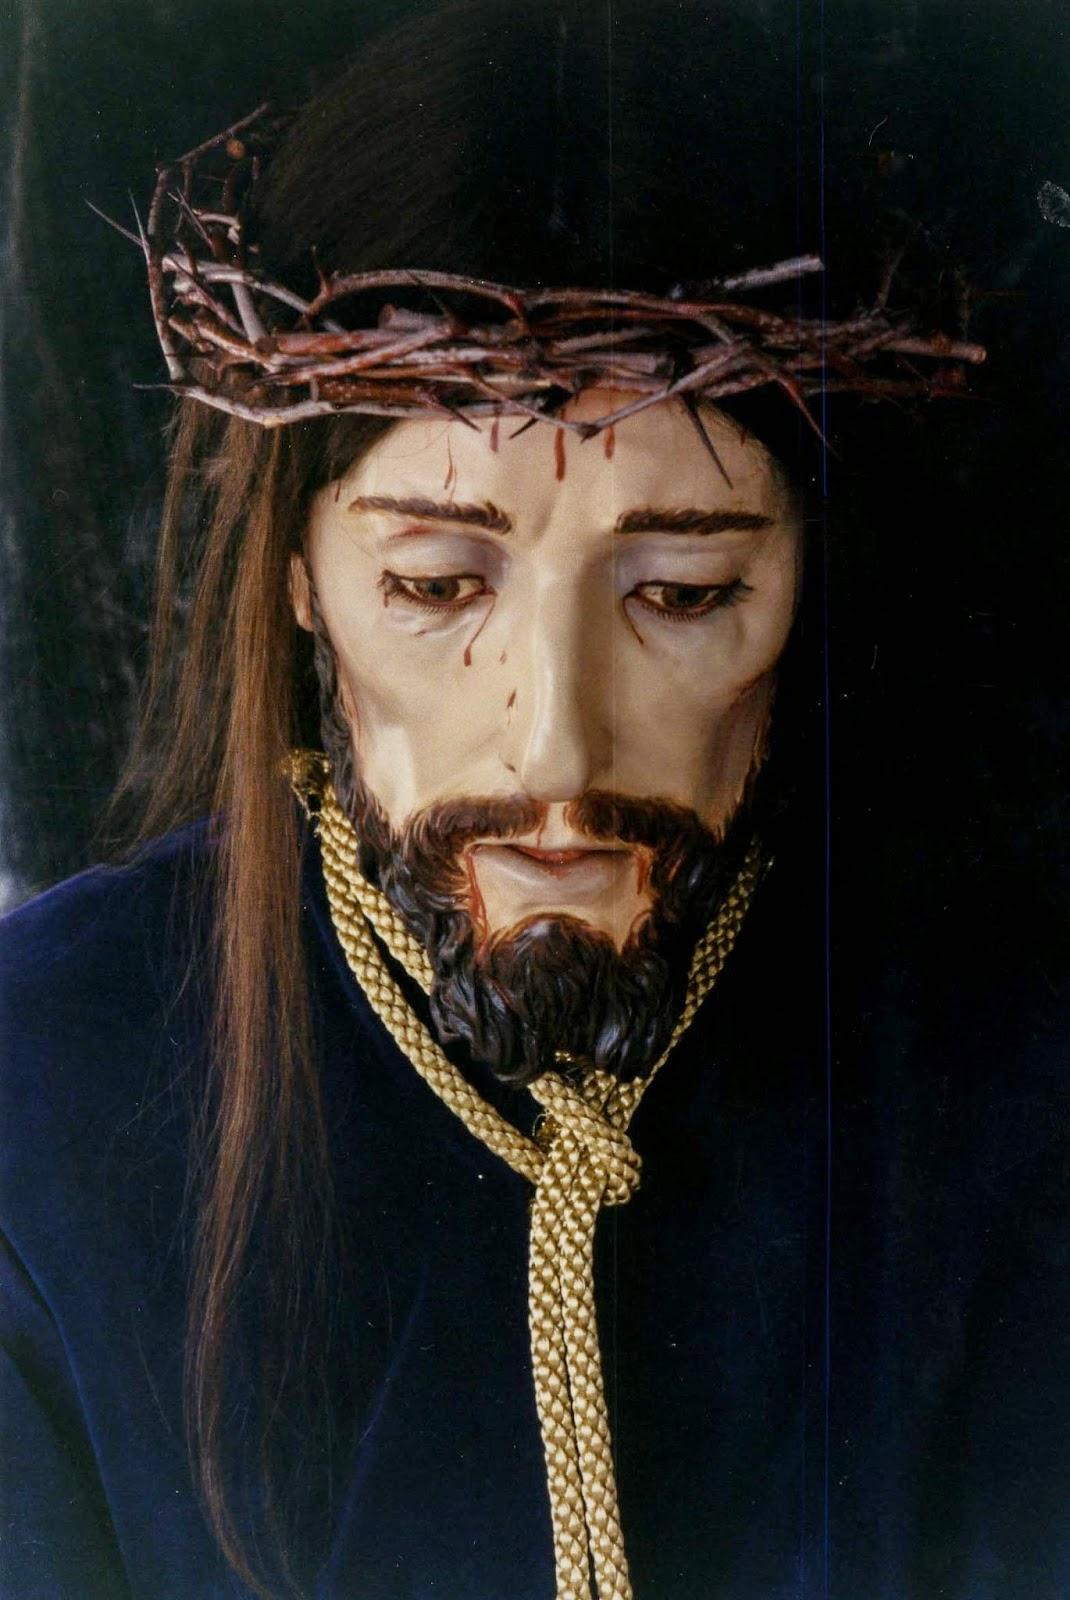 Cristo Misericordia La Algaida Arturo Serra Murcia escultura 1